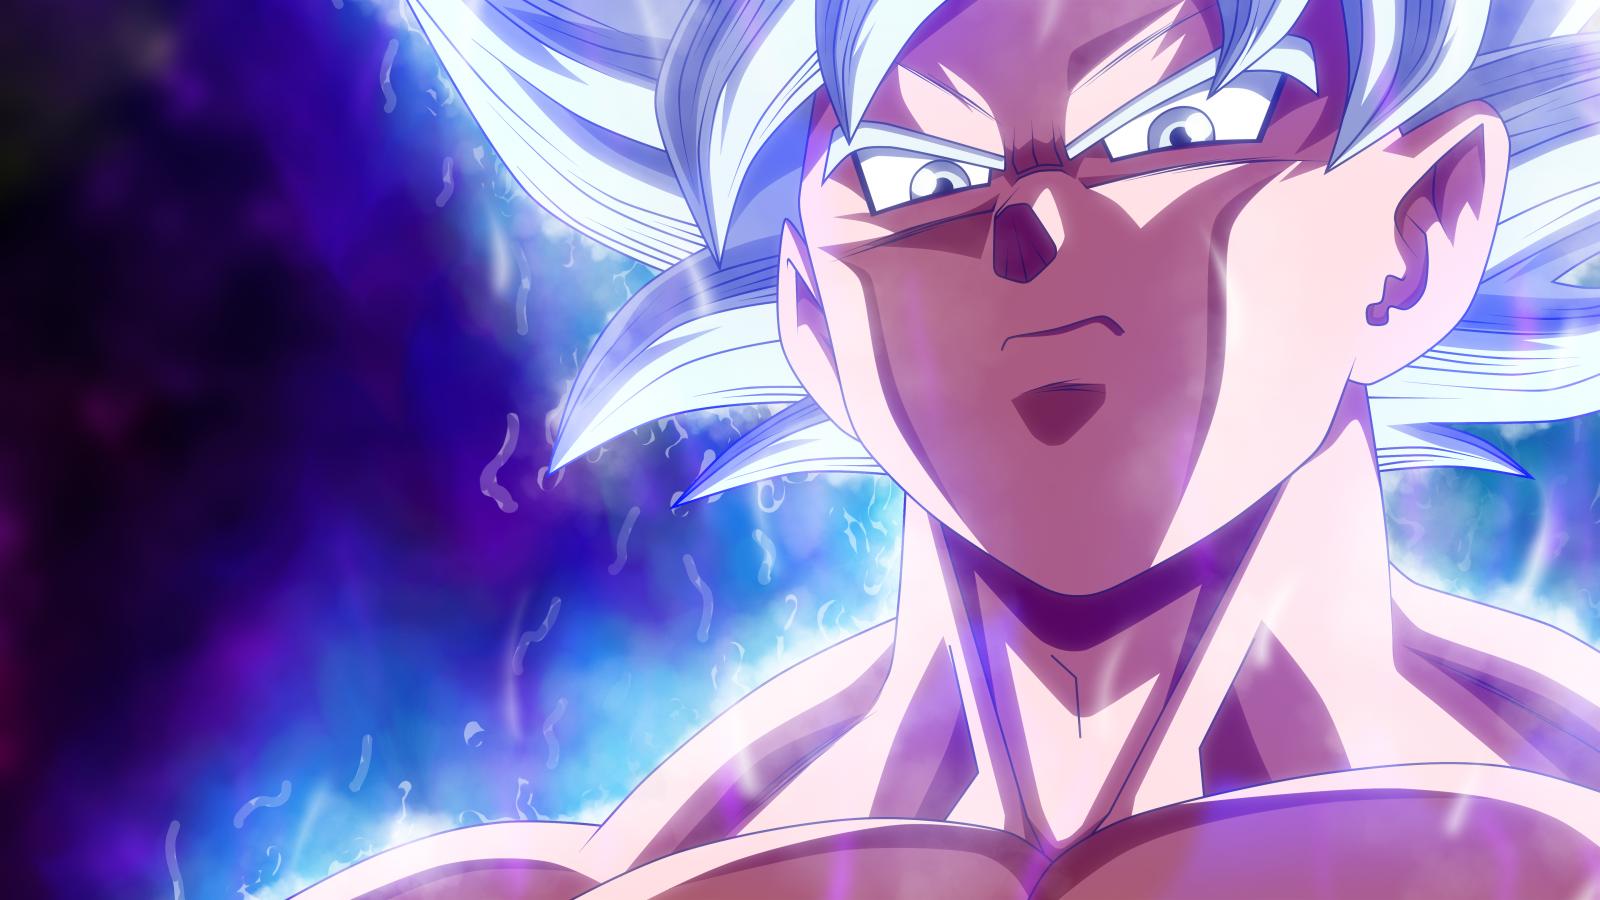 Dragon Ball Super Ultra Instinct Wallpaper: Wallpaper : Dragon Ball Super, Son Goku, Mastered Ultra